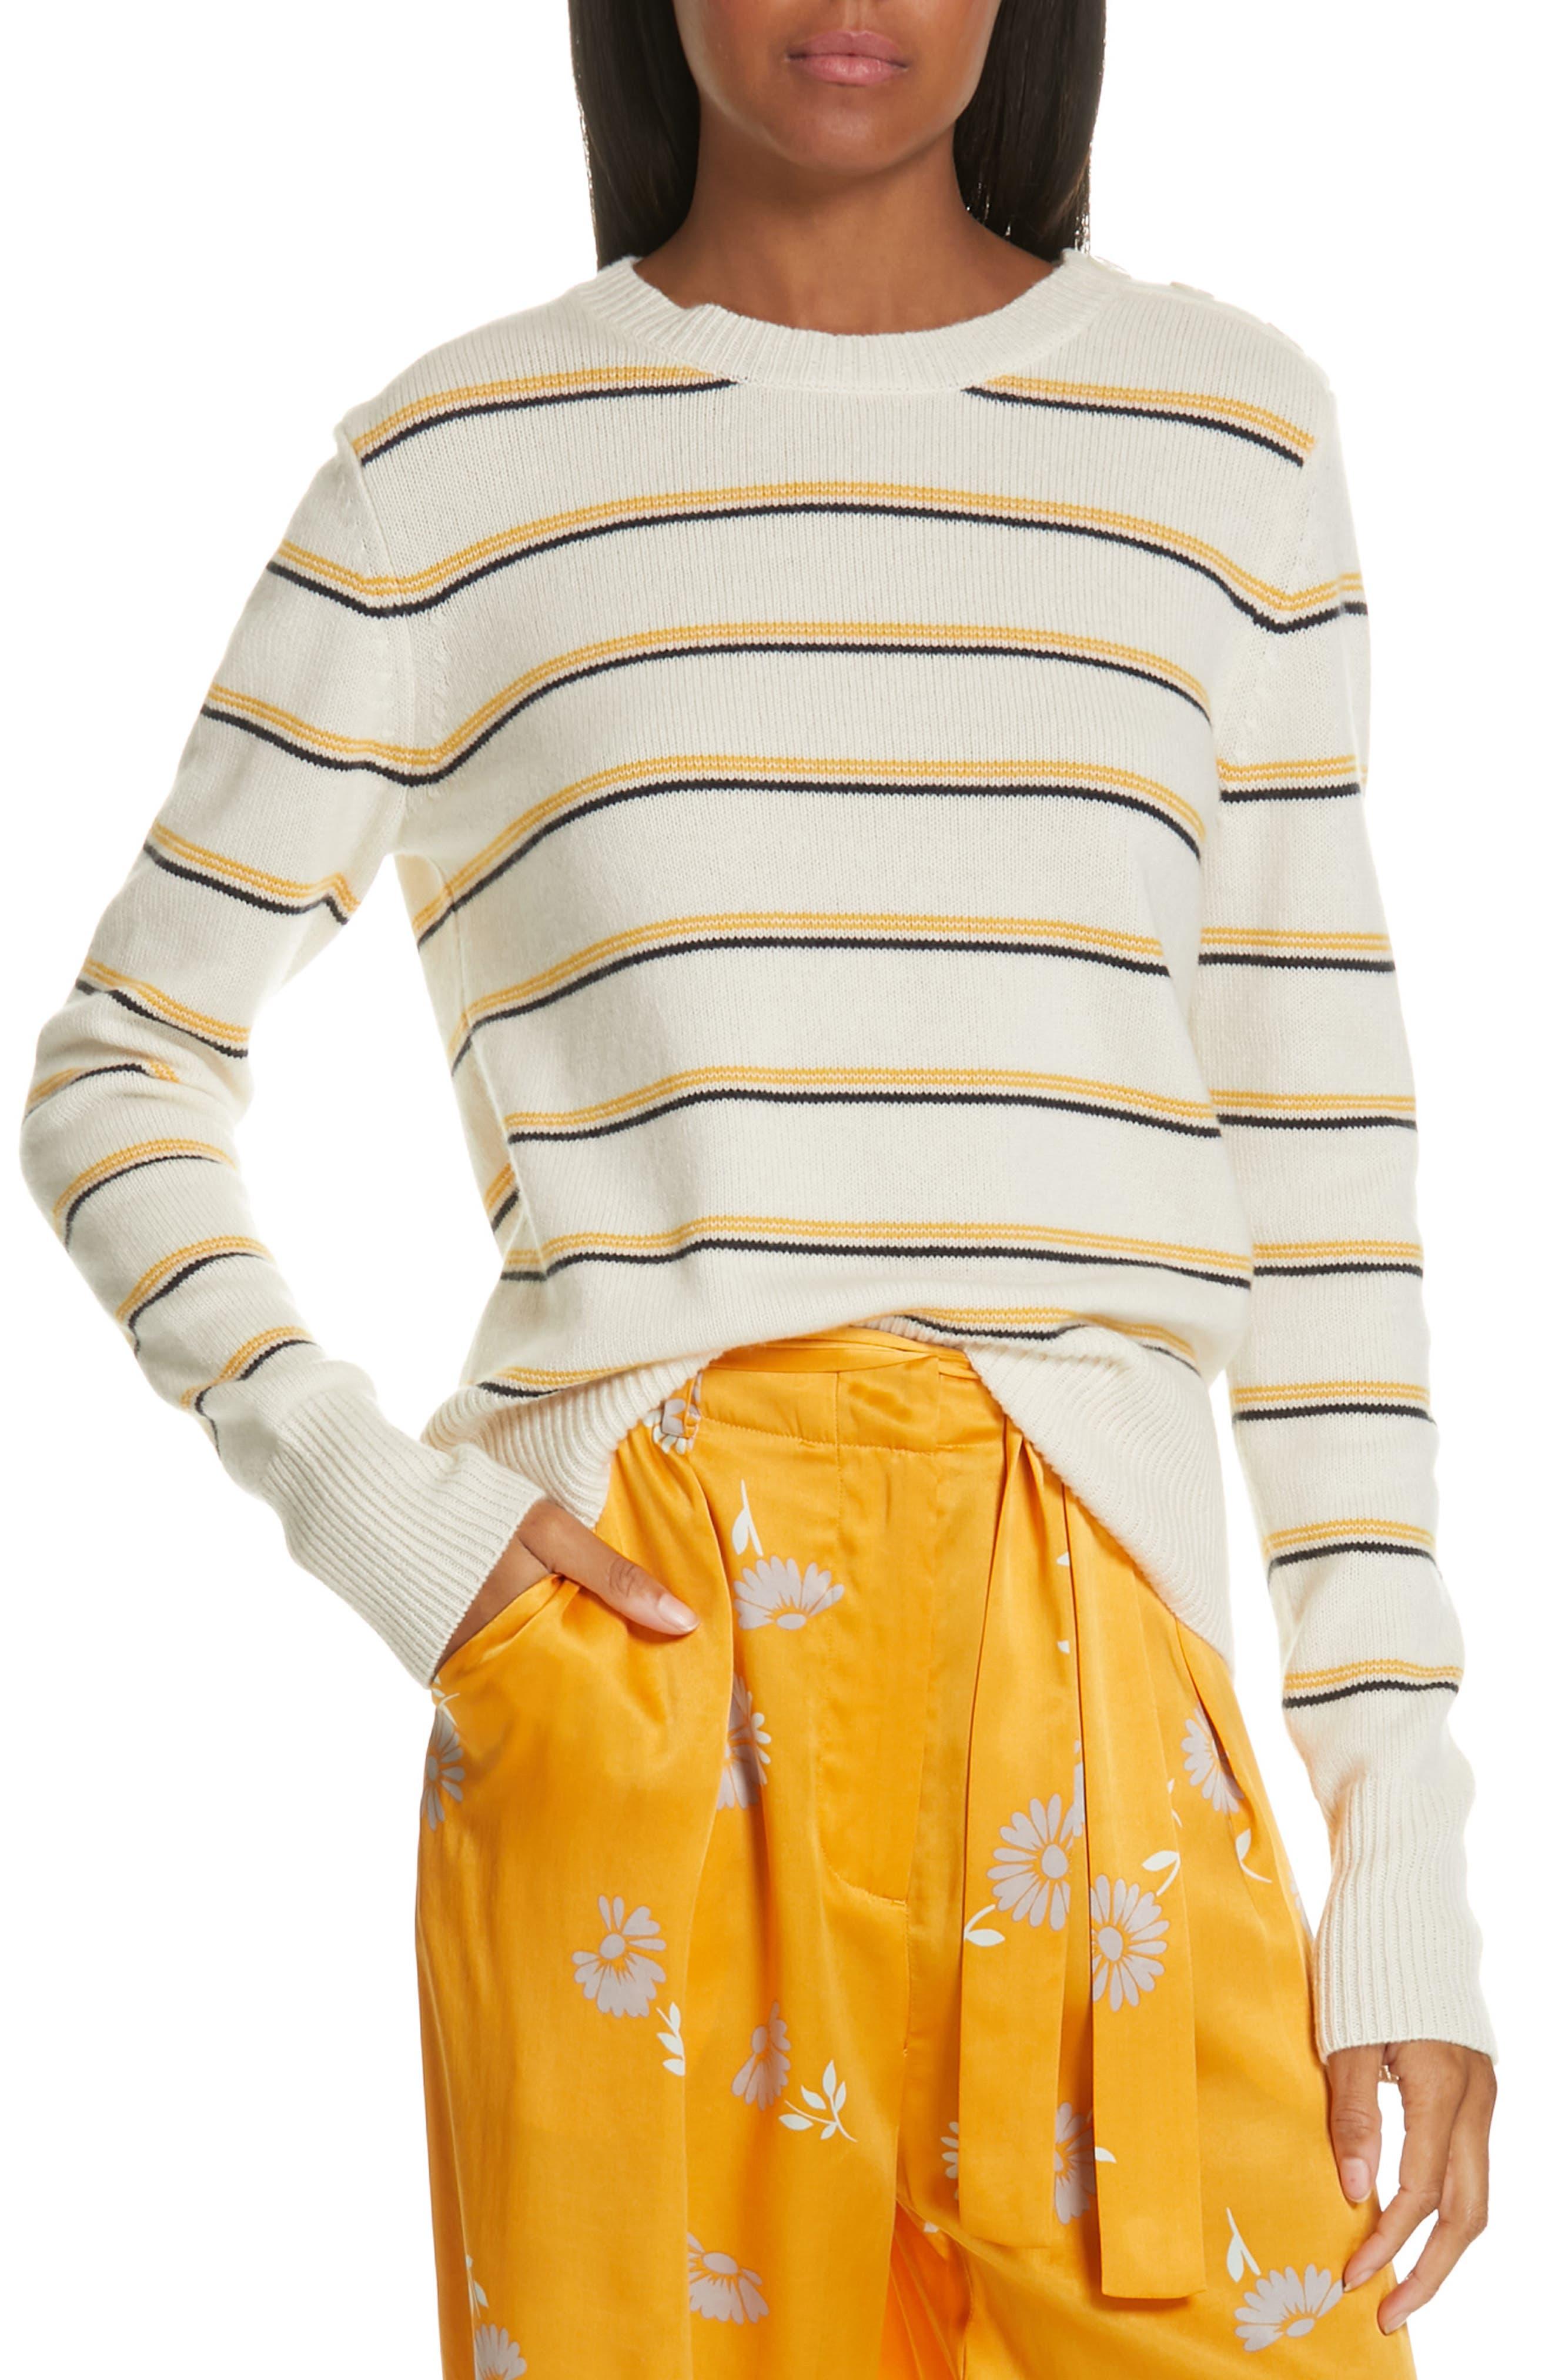 Duru Wool & Cashmere Sweater,                             Main thumbnail 1, color,                             NATURE WHITE MULTI